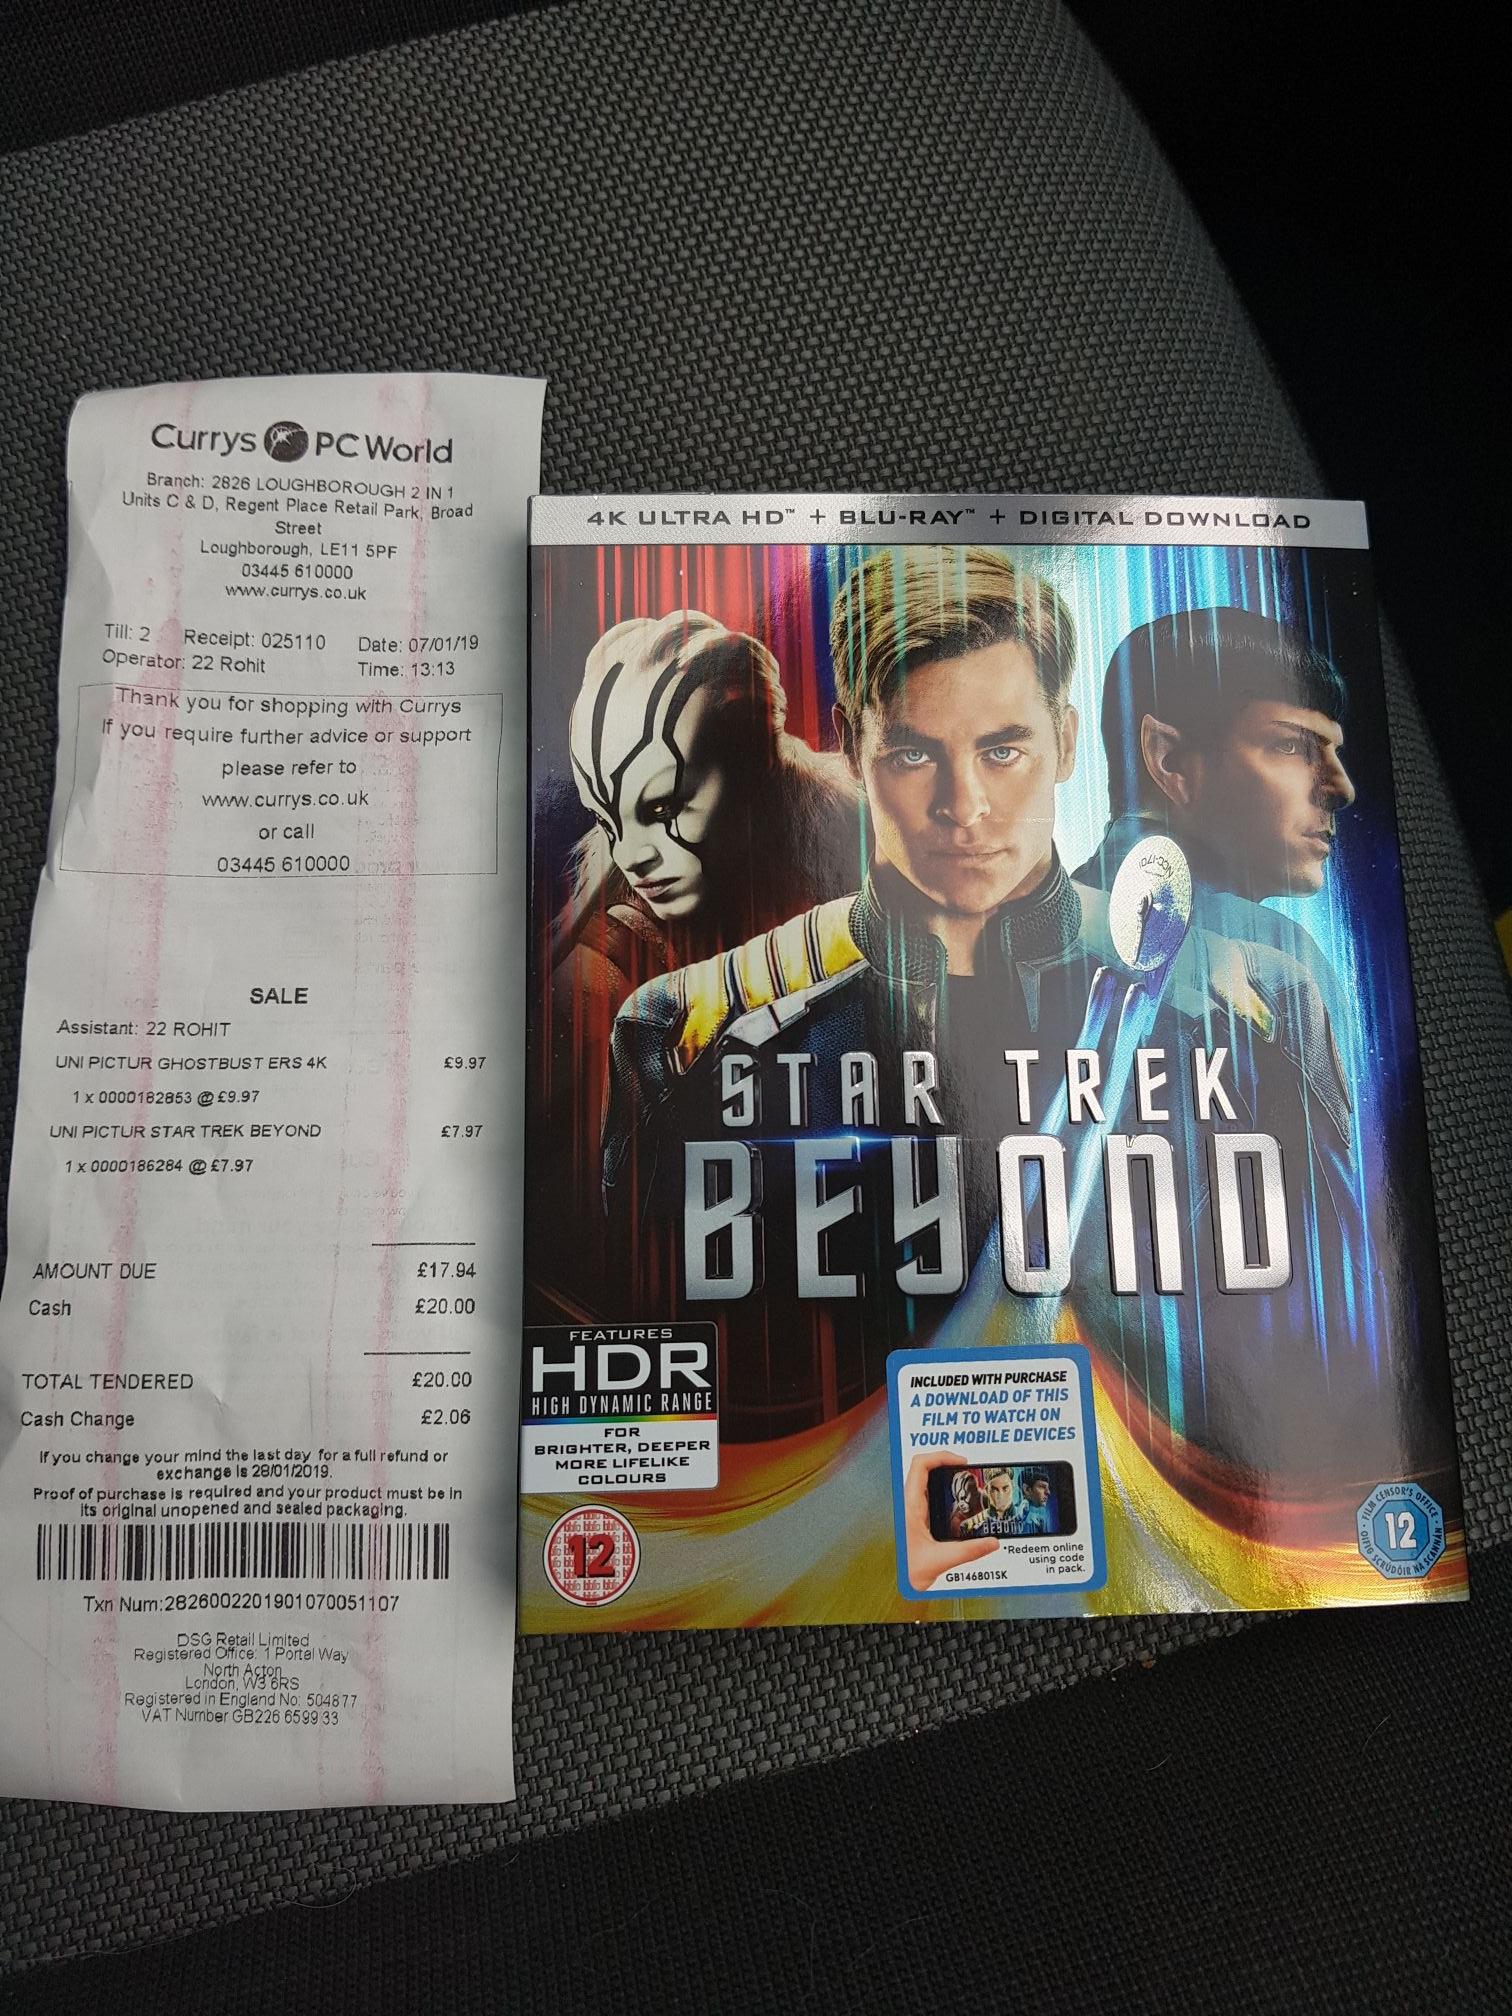 Star Trek Beyond 4K Blu Ray £7.97 at Currys